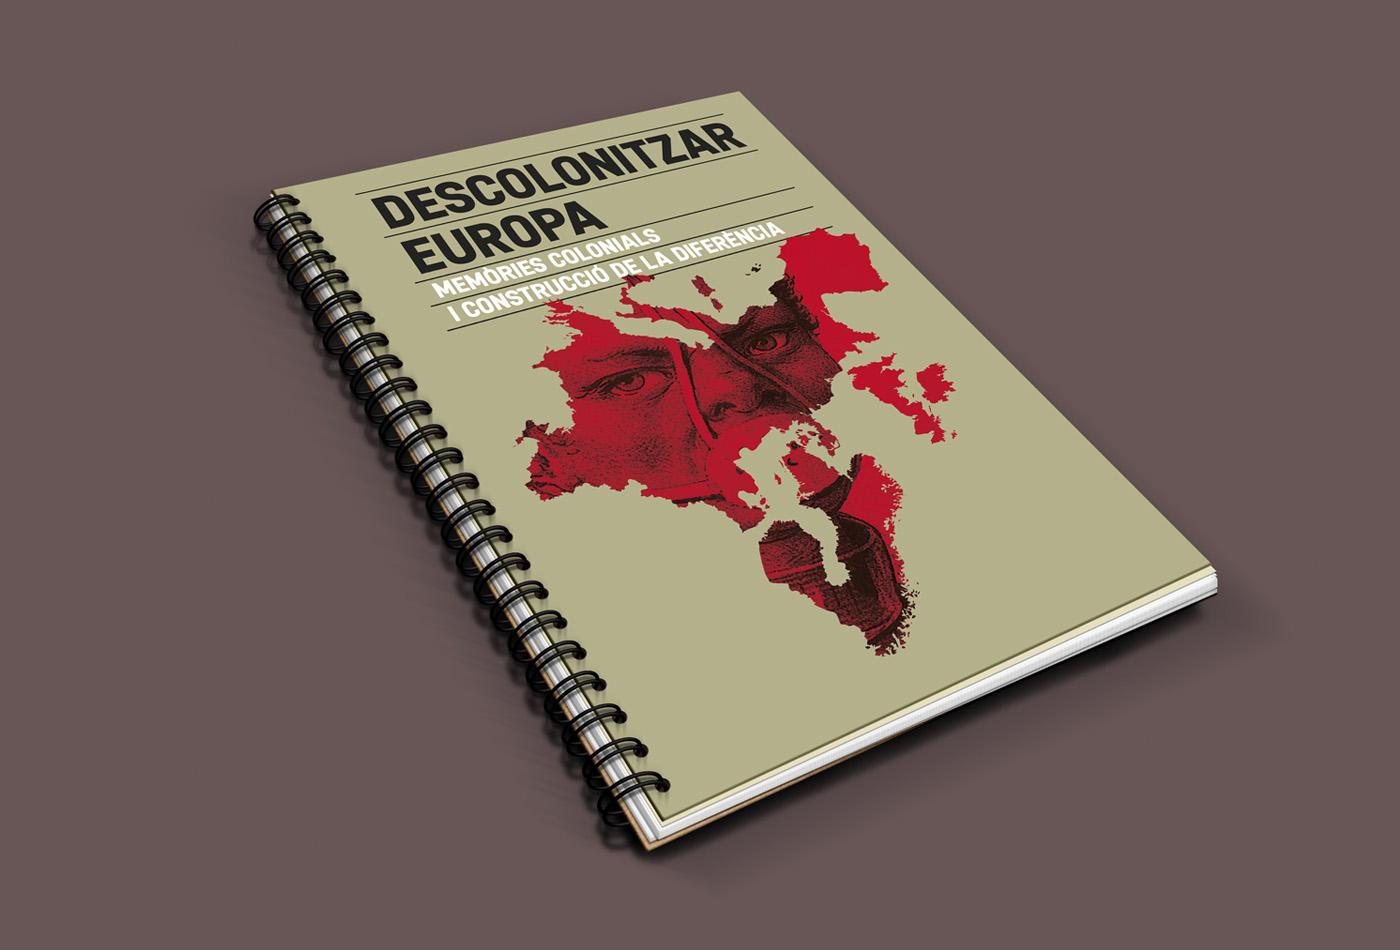 gráfica-descolonizar-born-imatge-barcelona